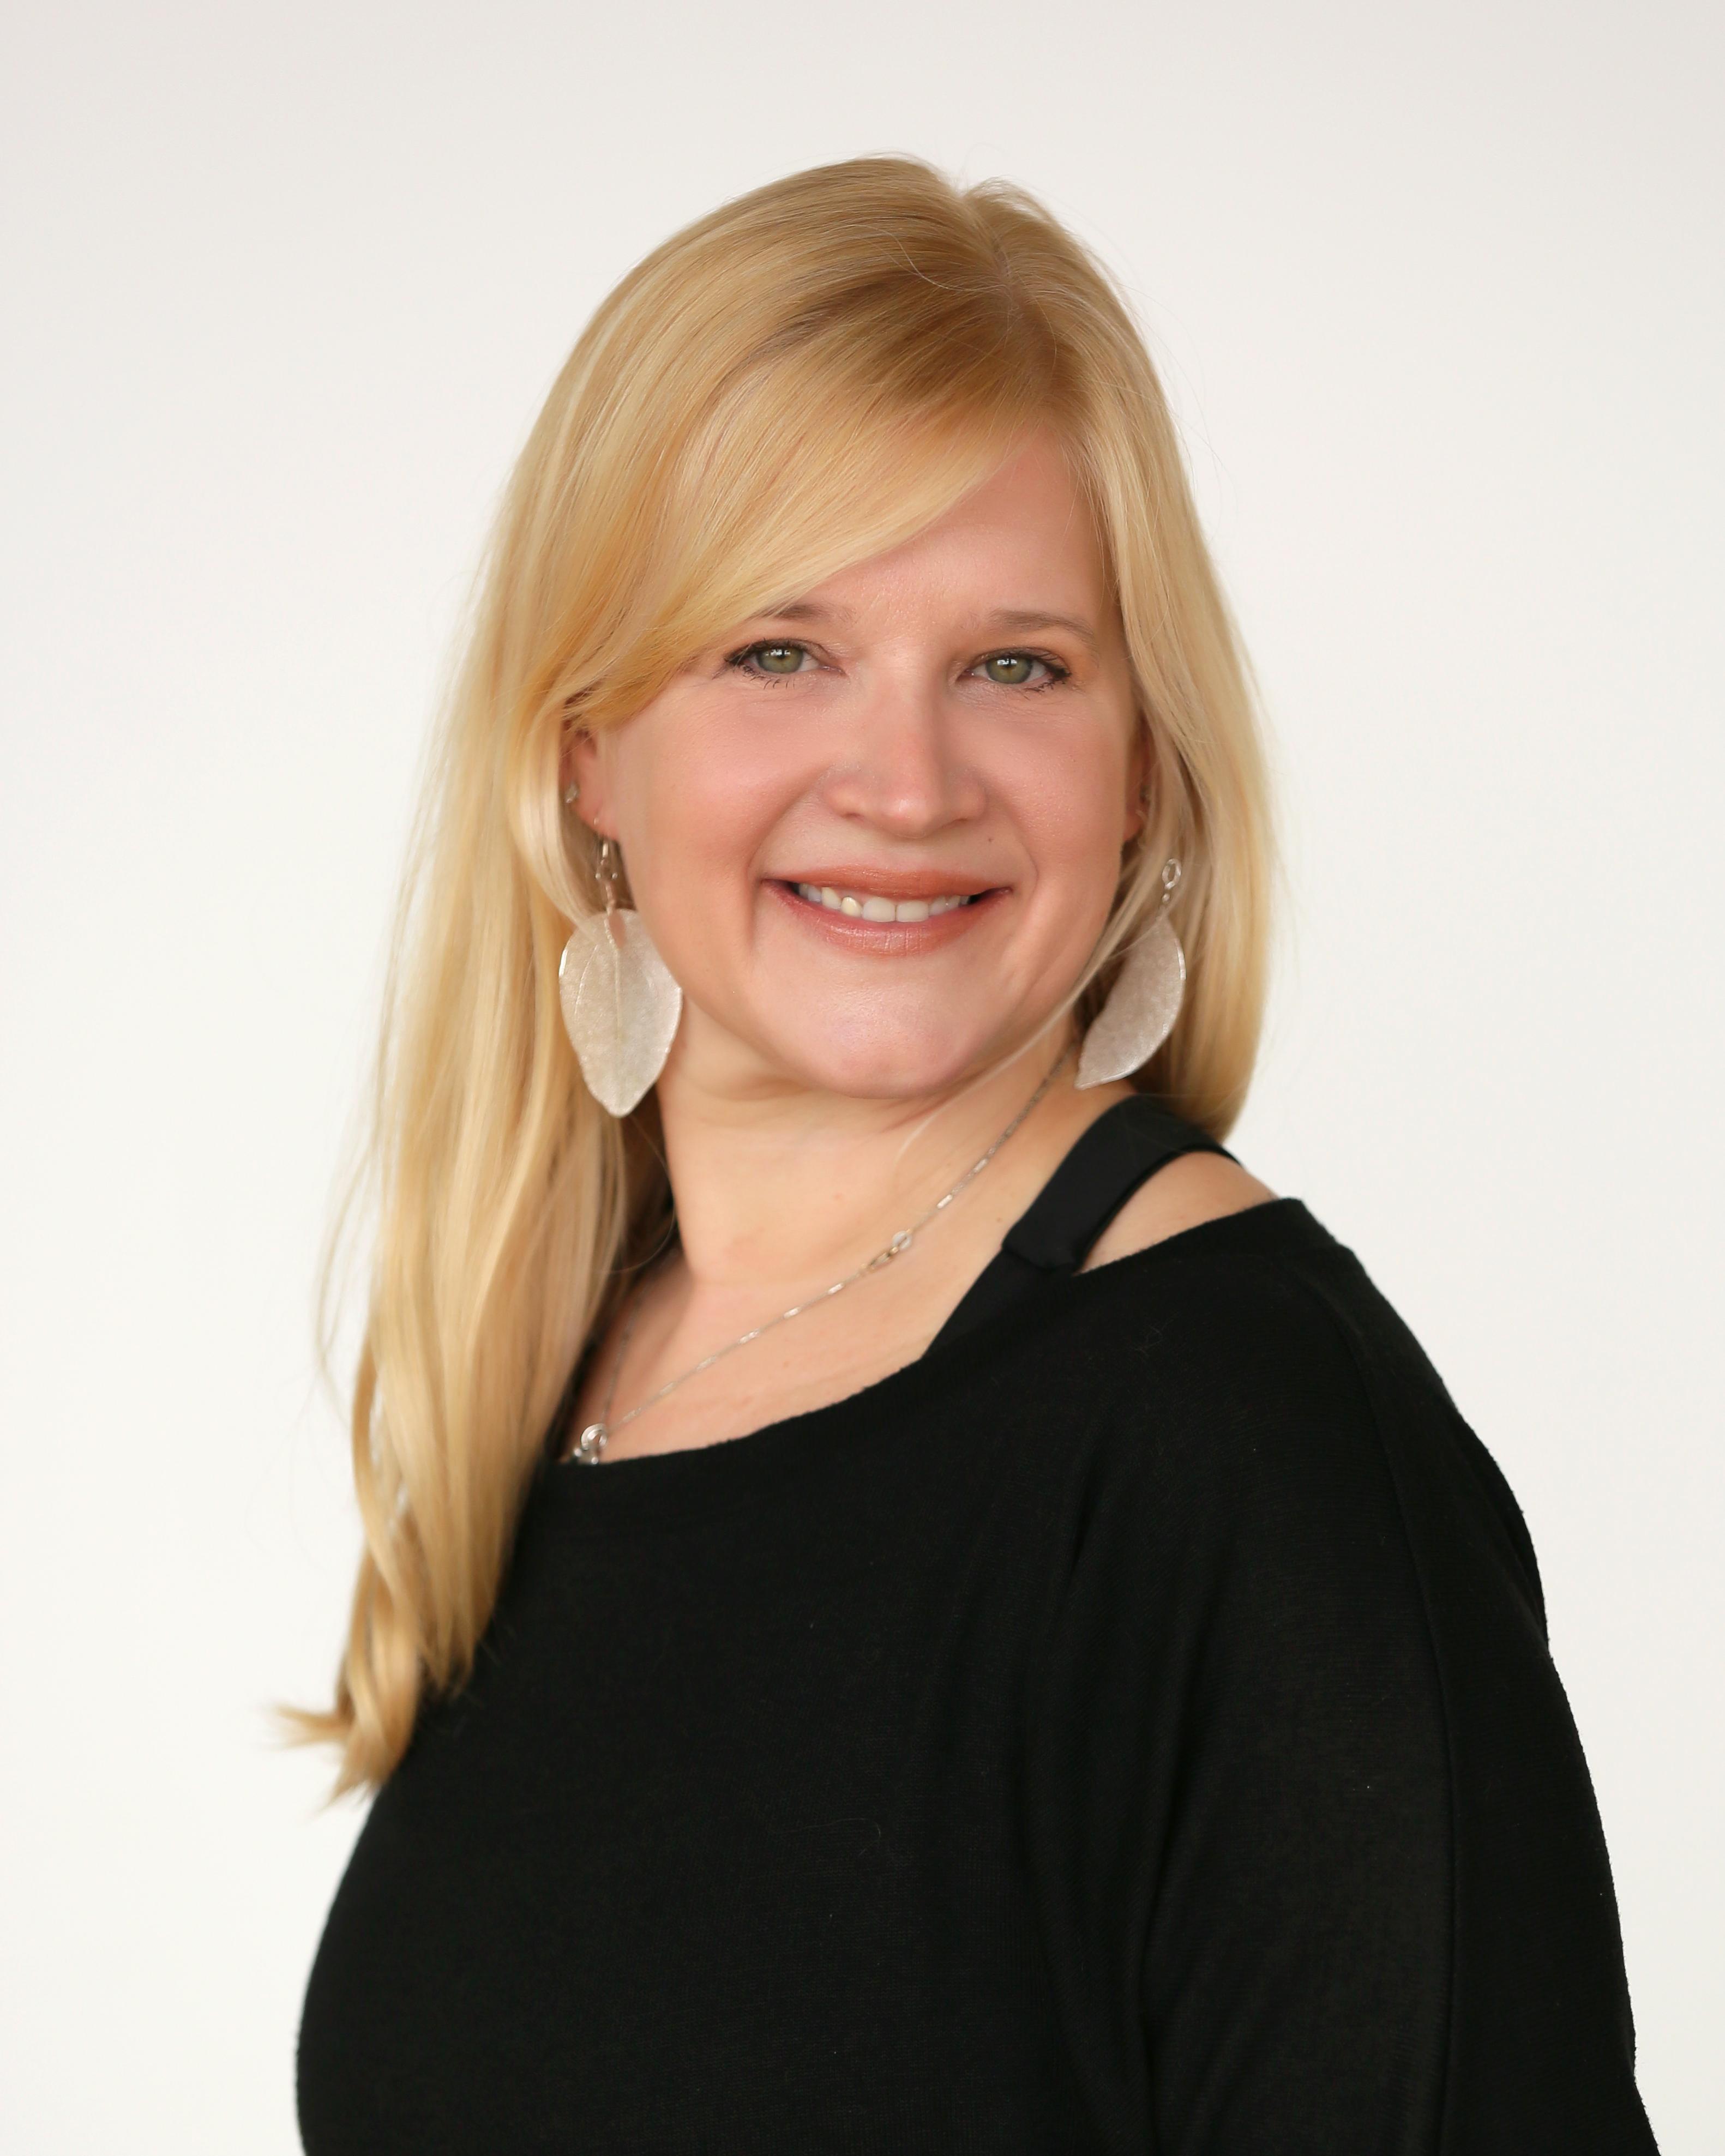 Jacqueline A. undefined Jakacki